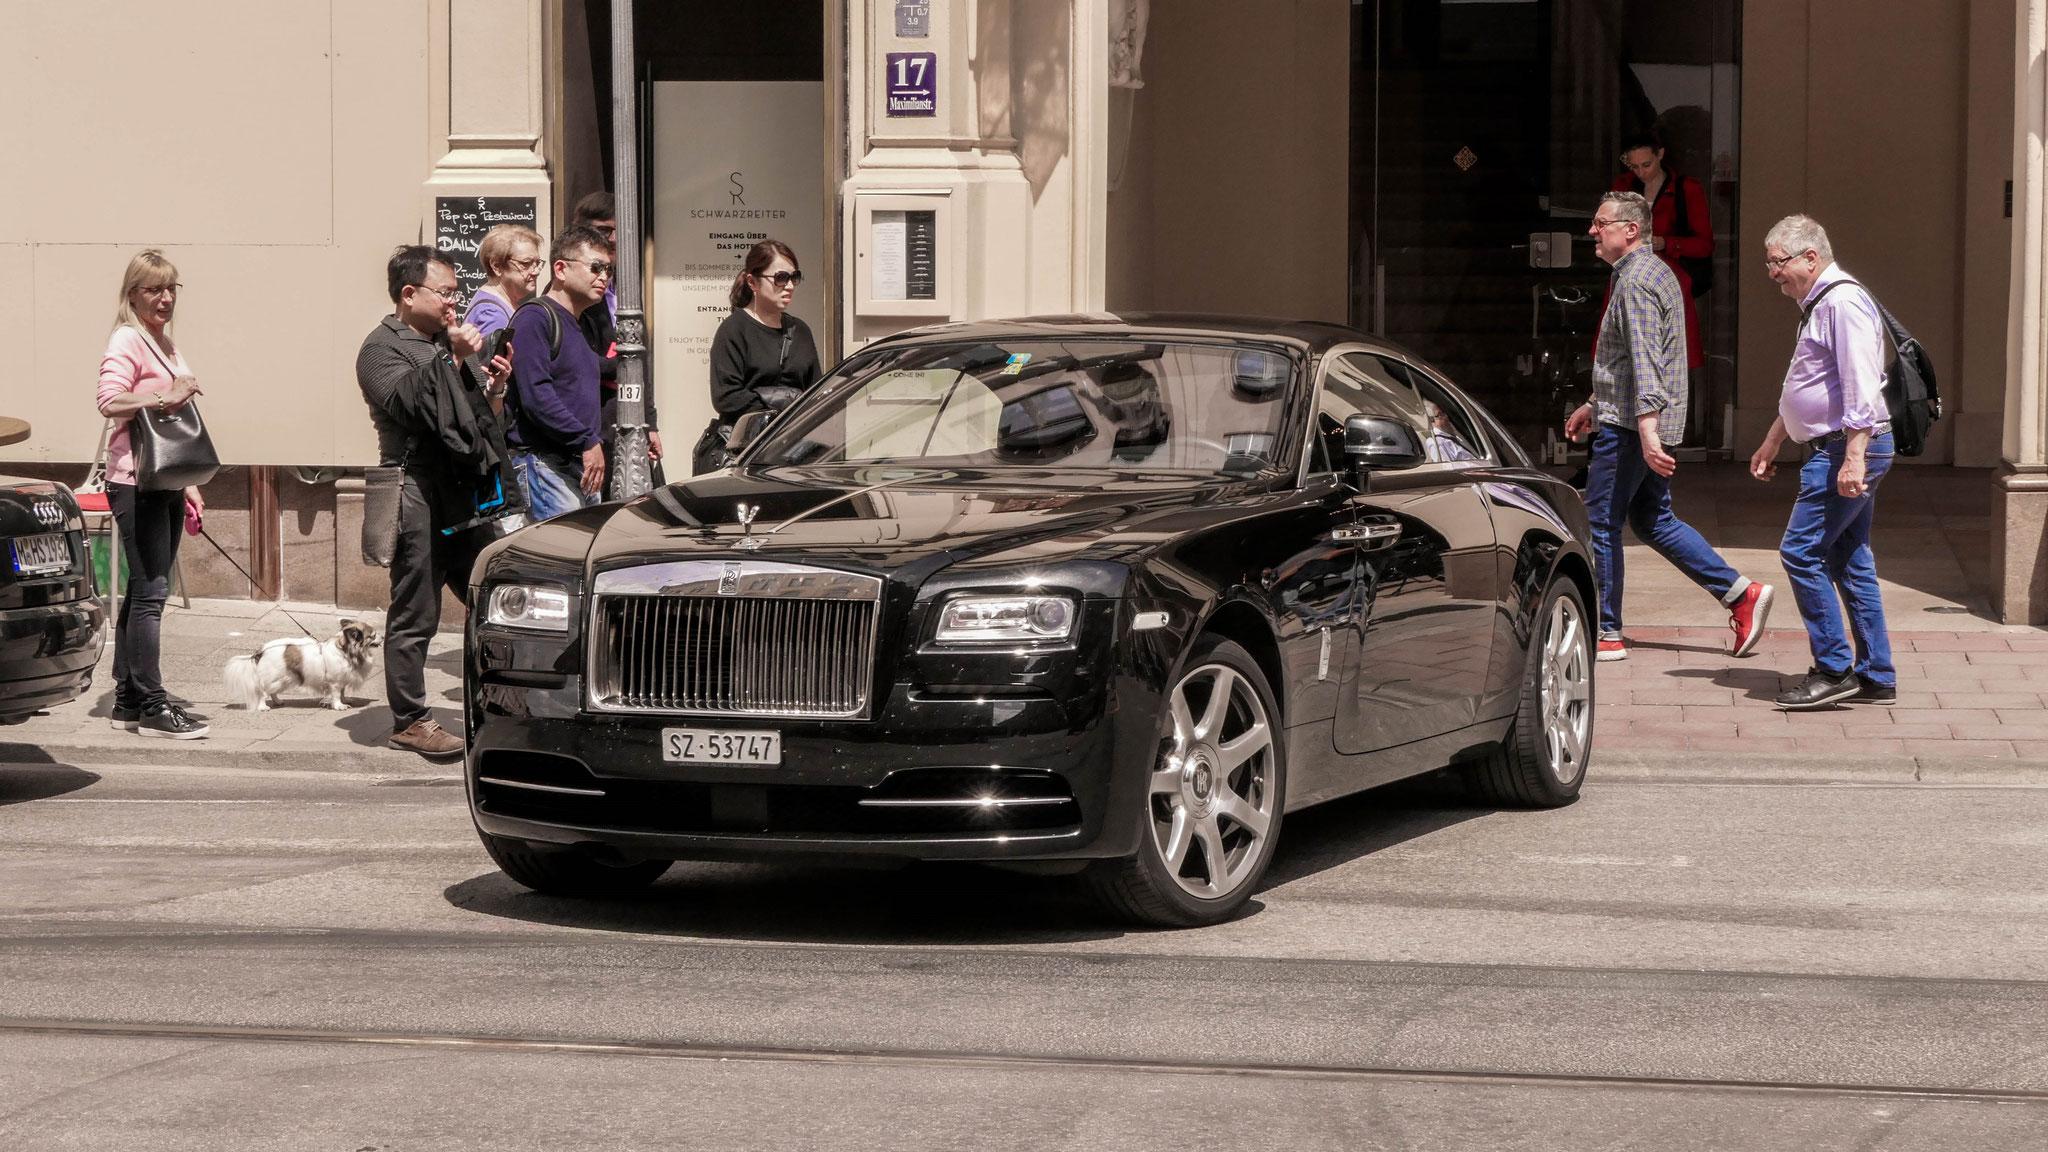 Rolls Royce Wraith - SZ-53747 (CH)